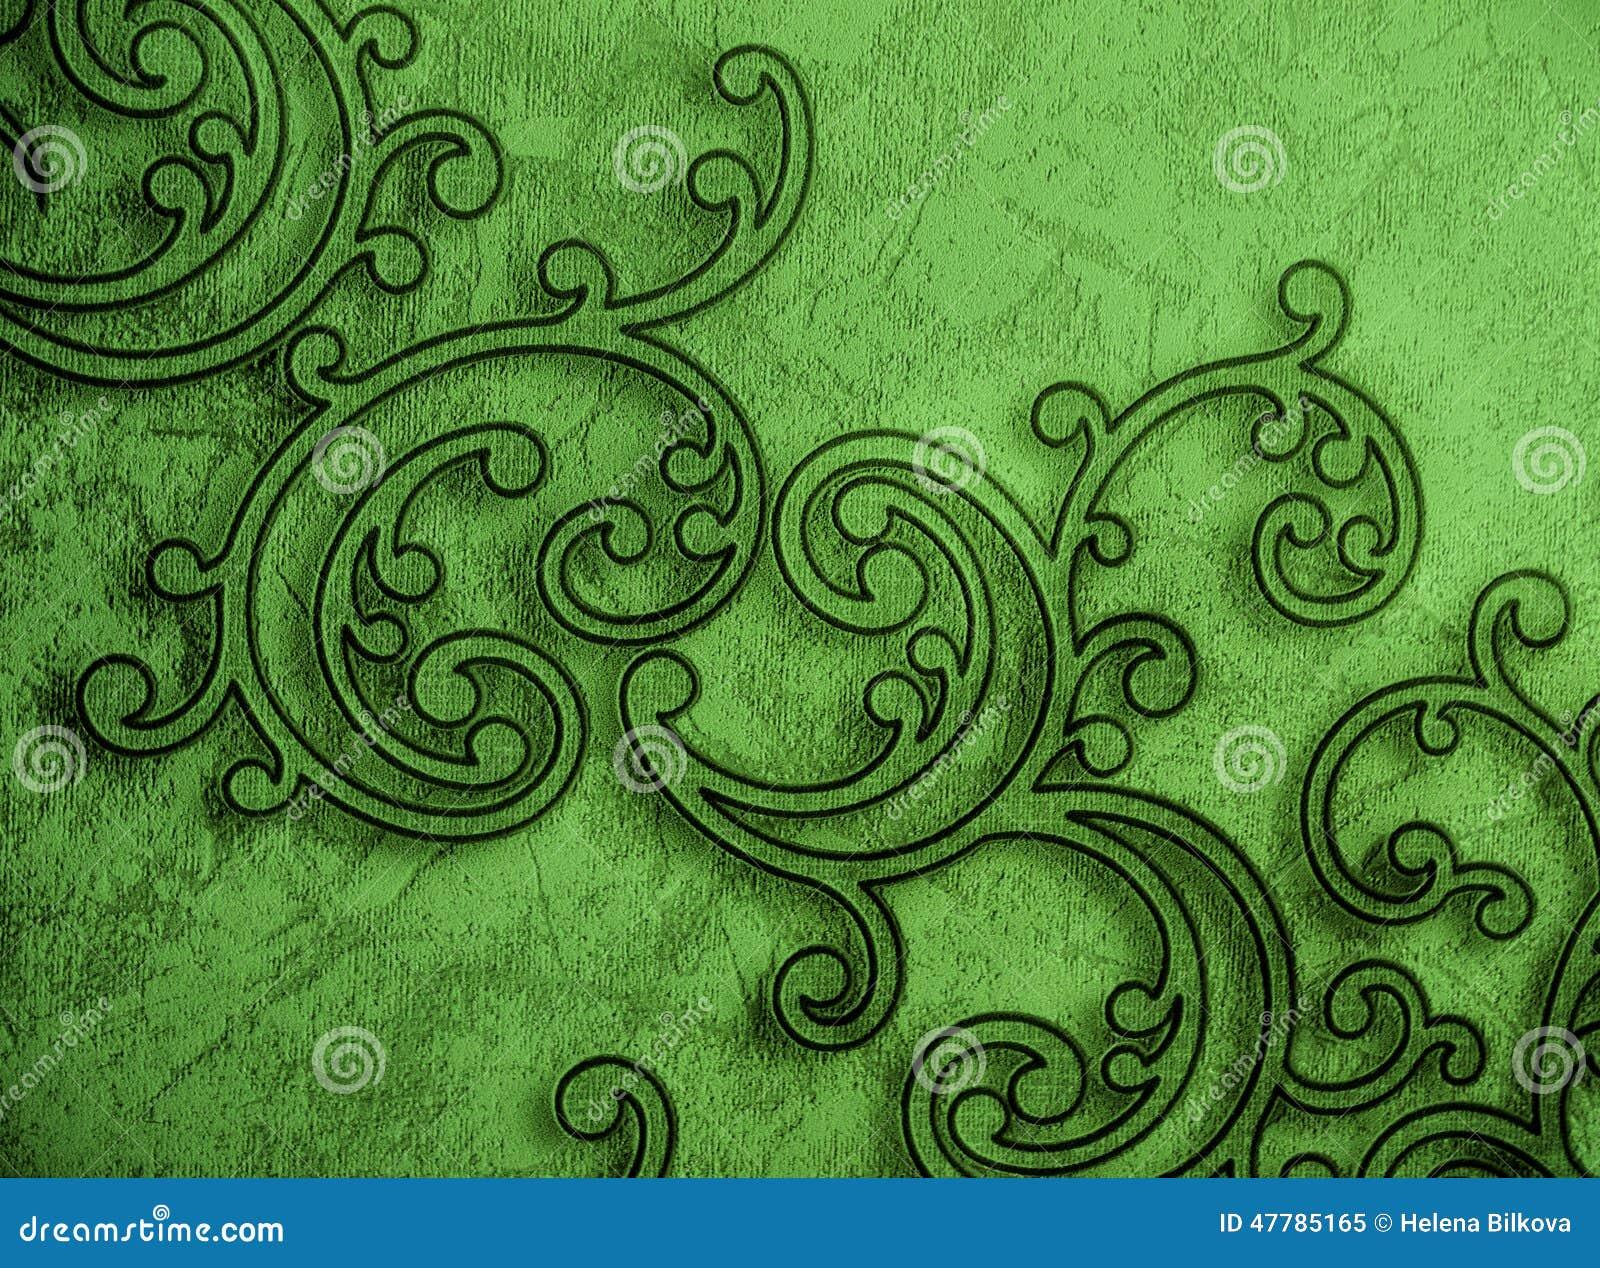 Behang Met Patroon : Patroon sier groen behang stock afbeelding afbeelding bestaande